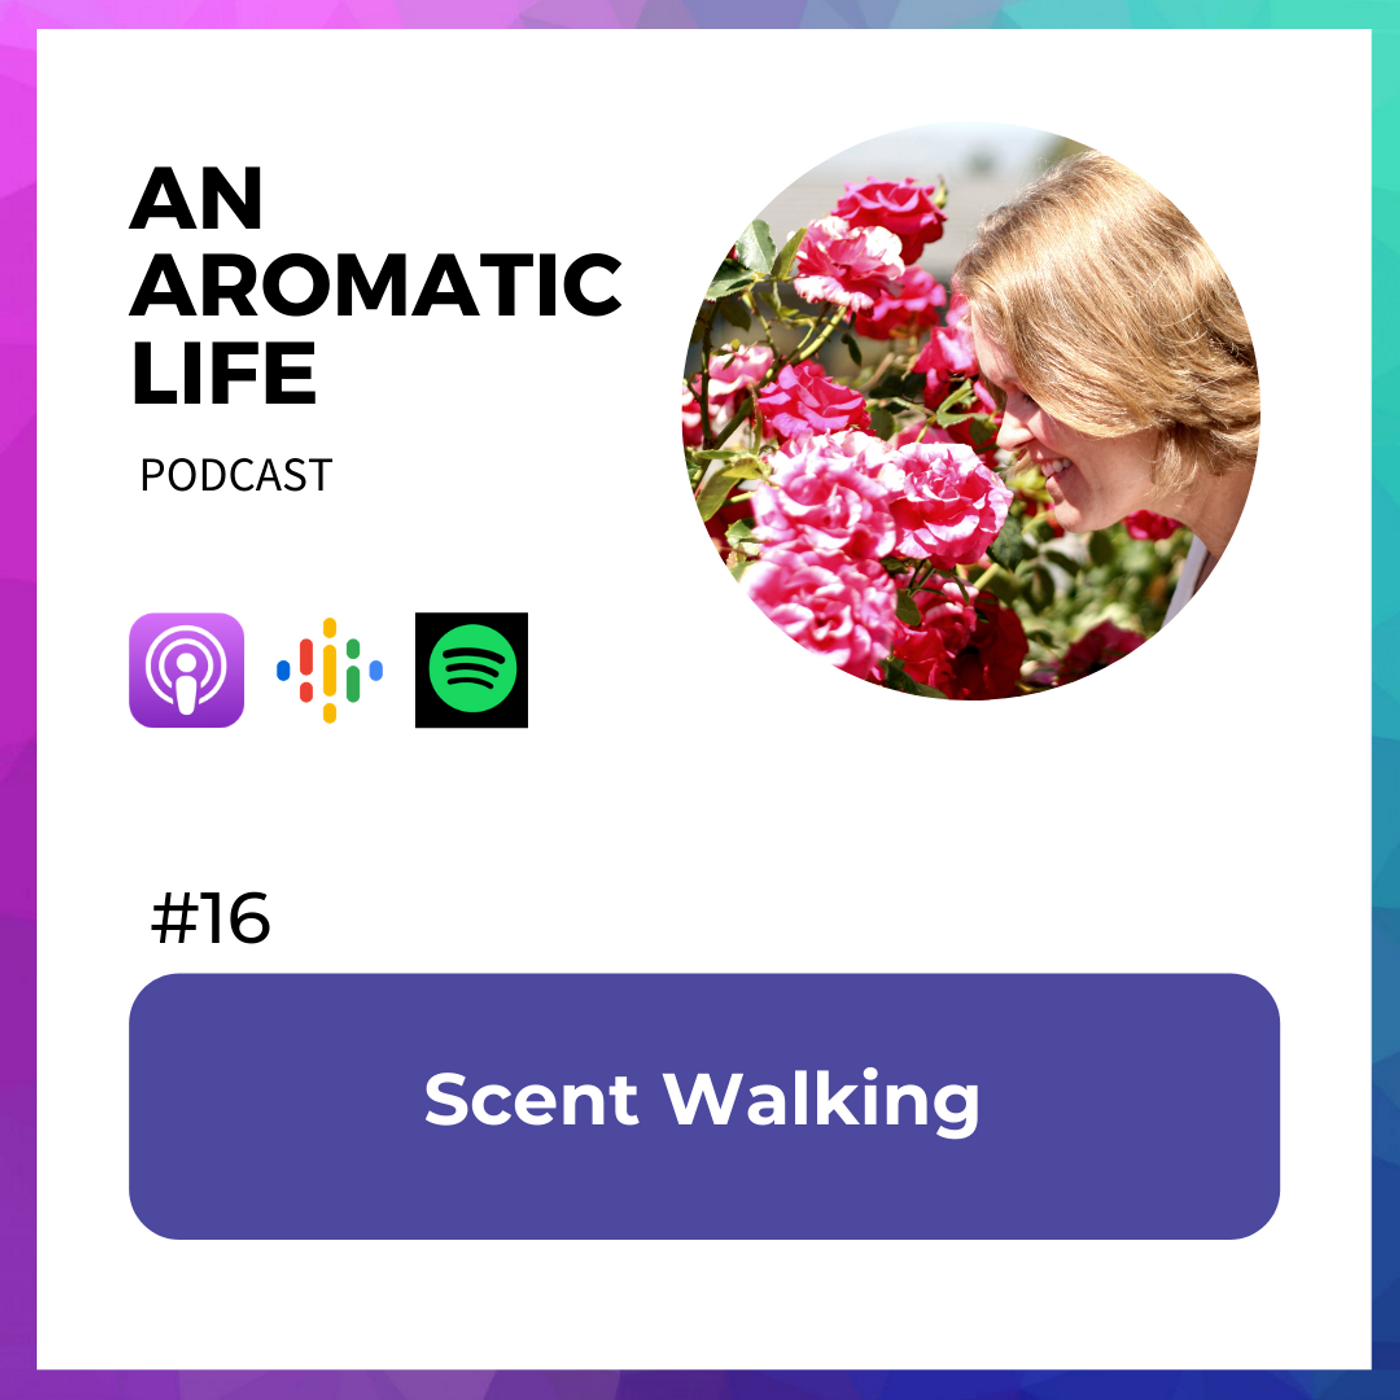 67knfyokqqygiab1qium podcast episode 16